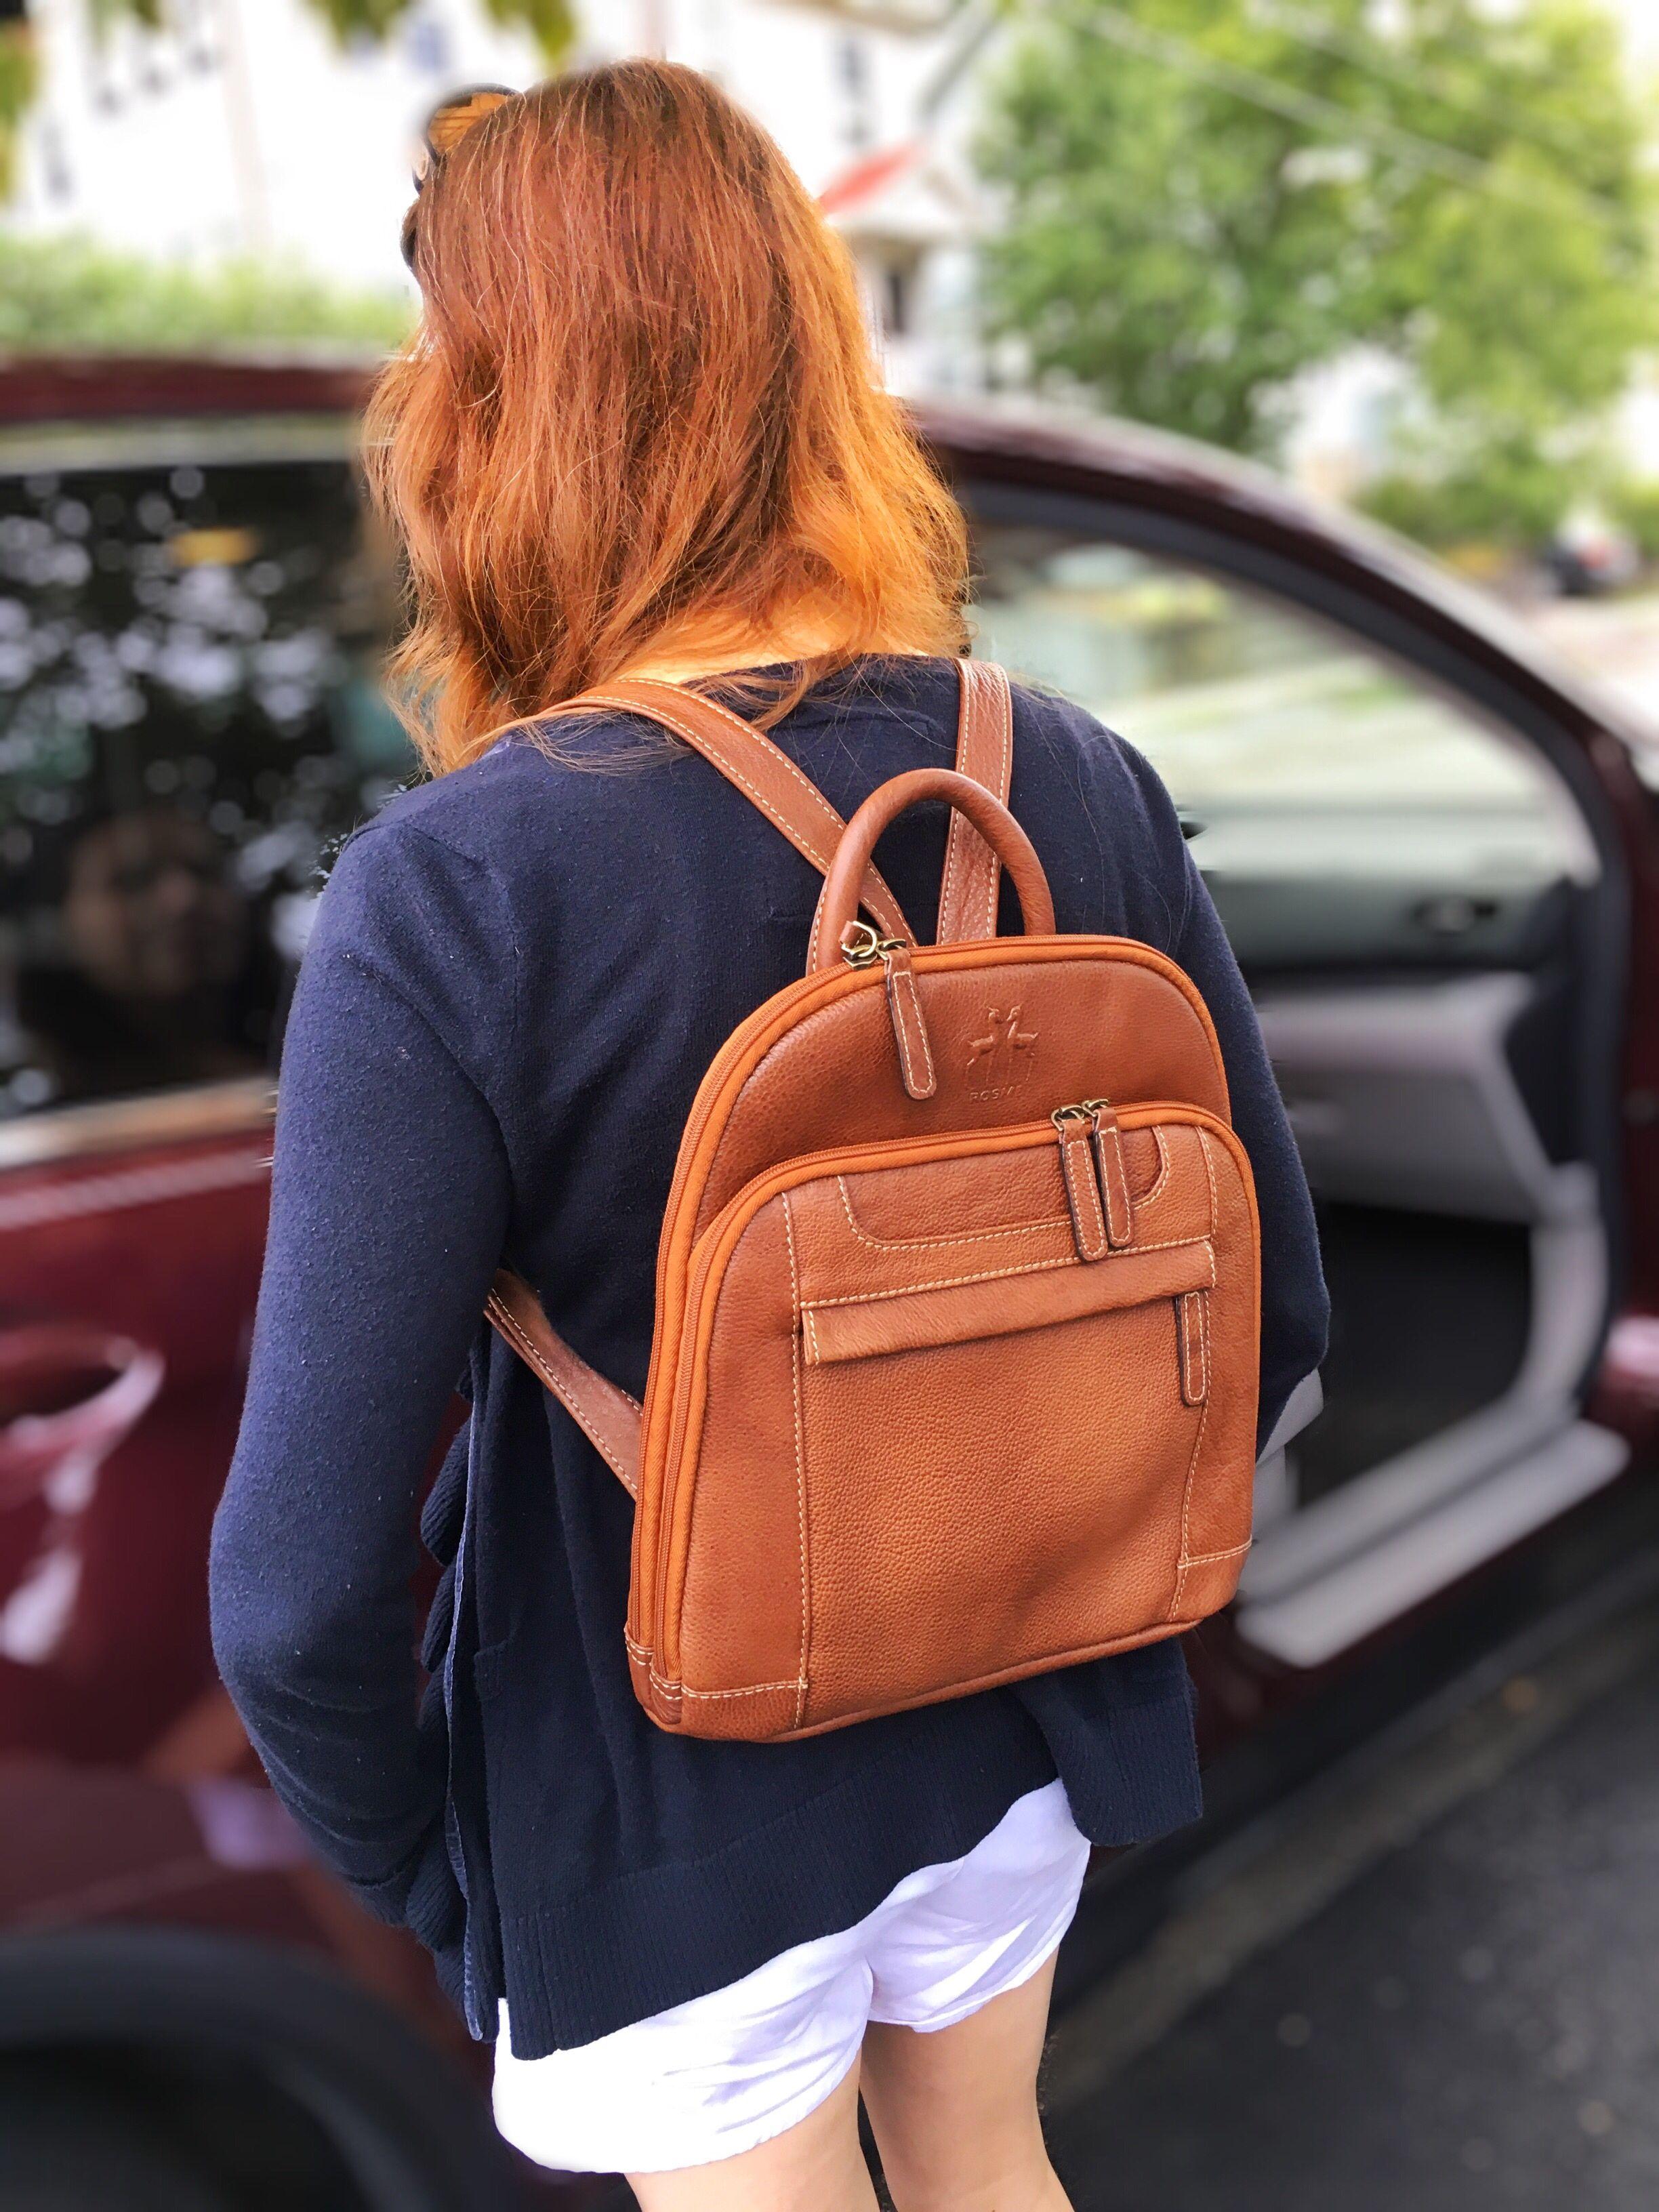 384c446928e Handmade leather backpack from seville spain bag purse pocketbook jpg  2448x3264 Backpacks from spain